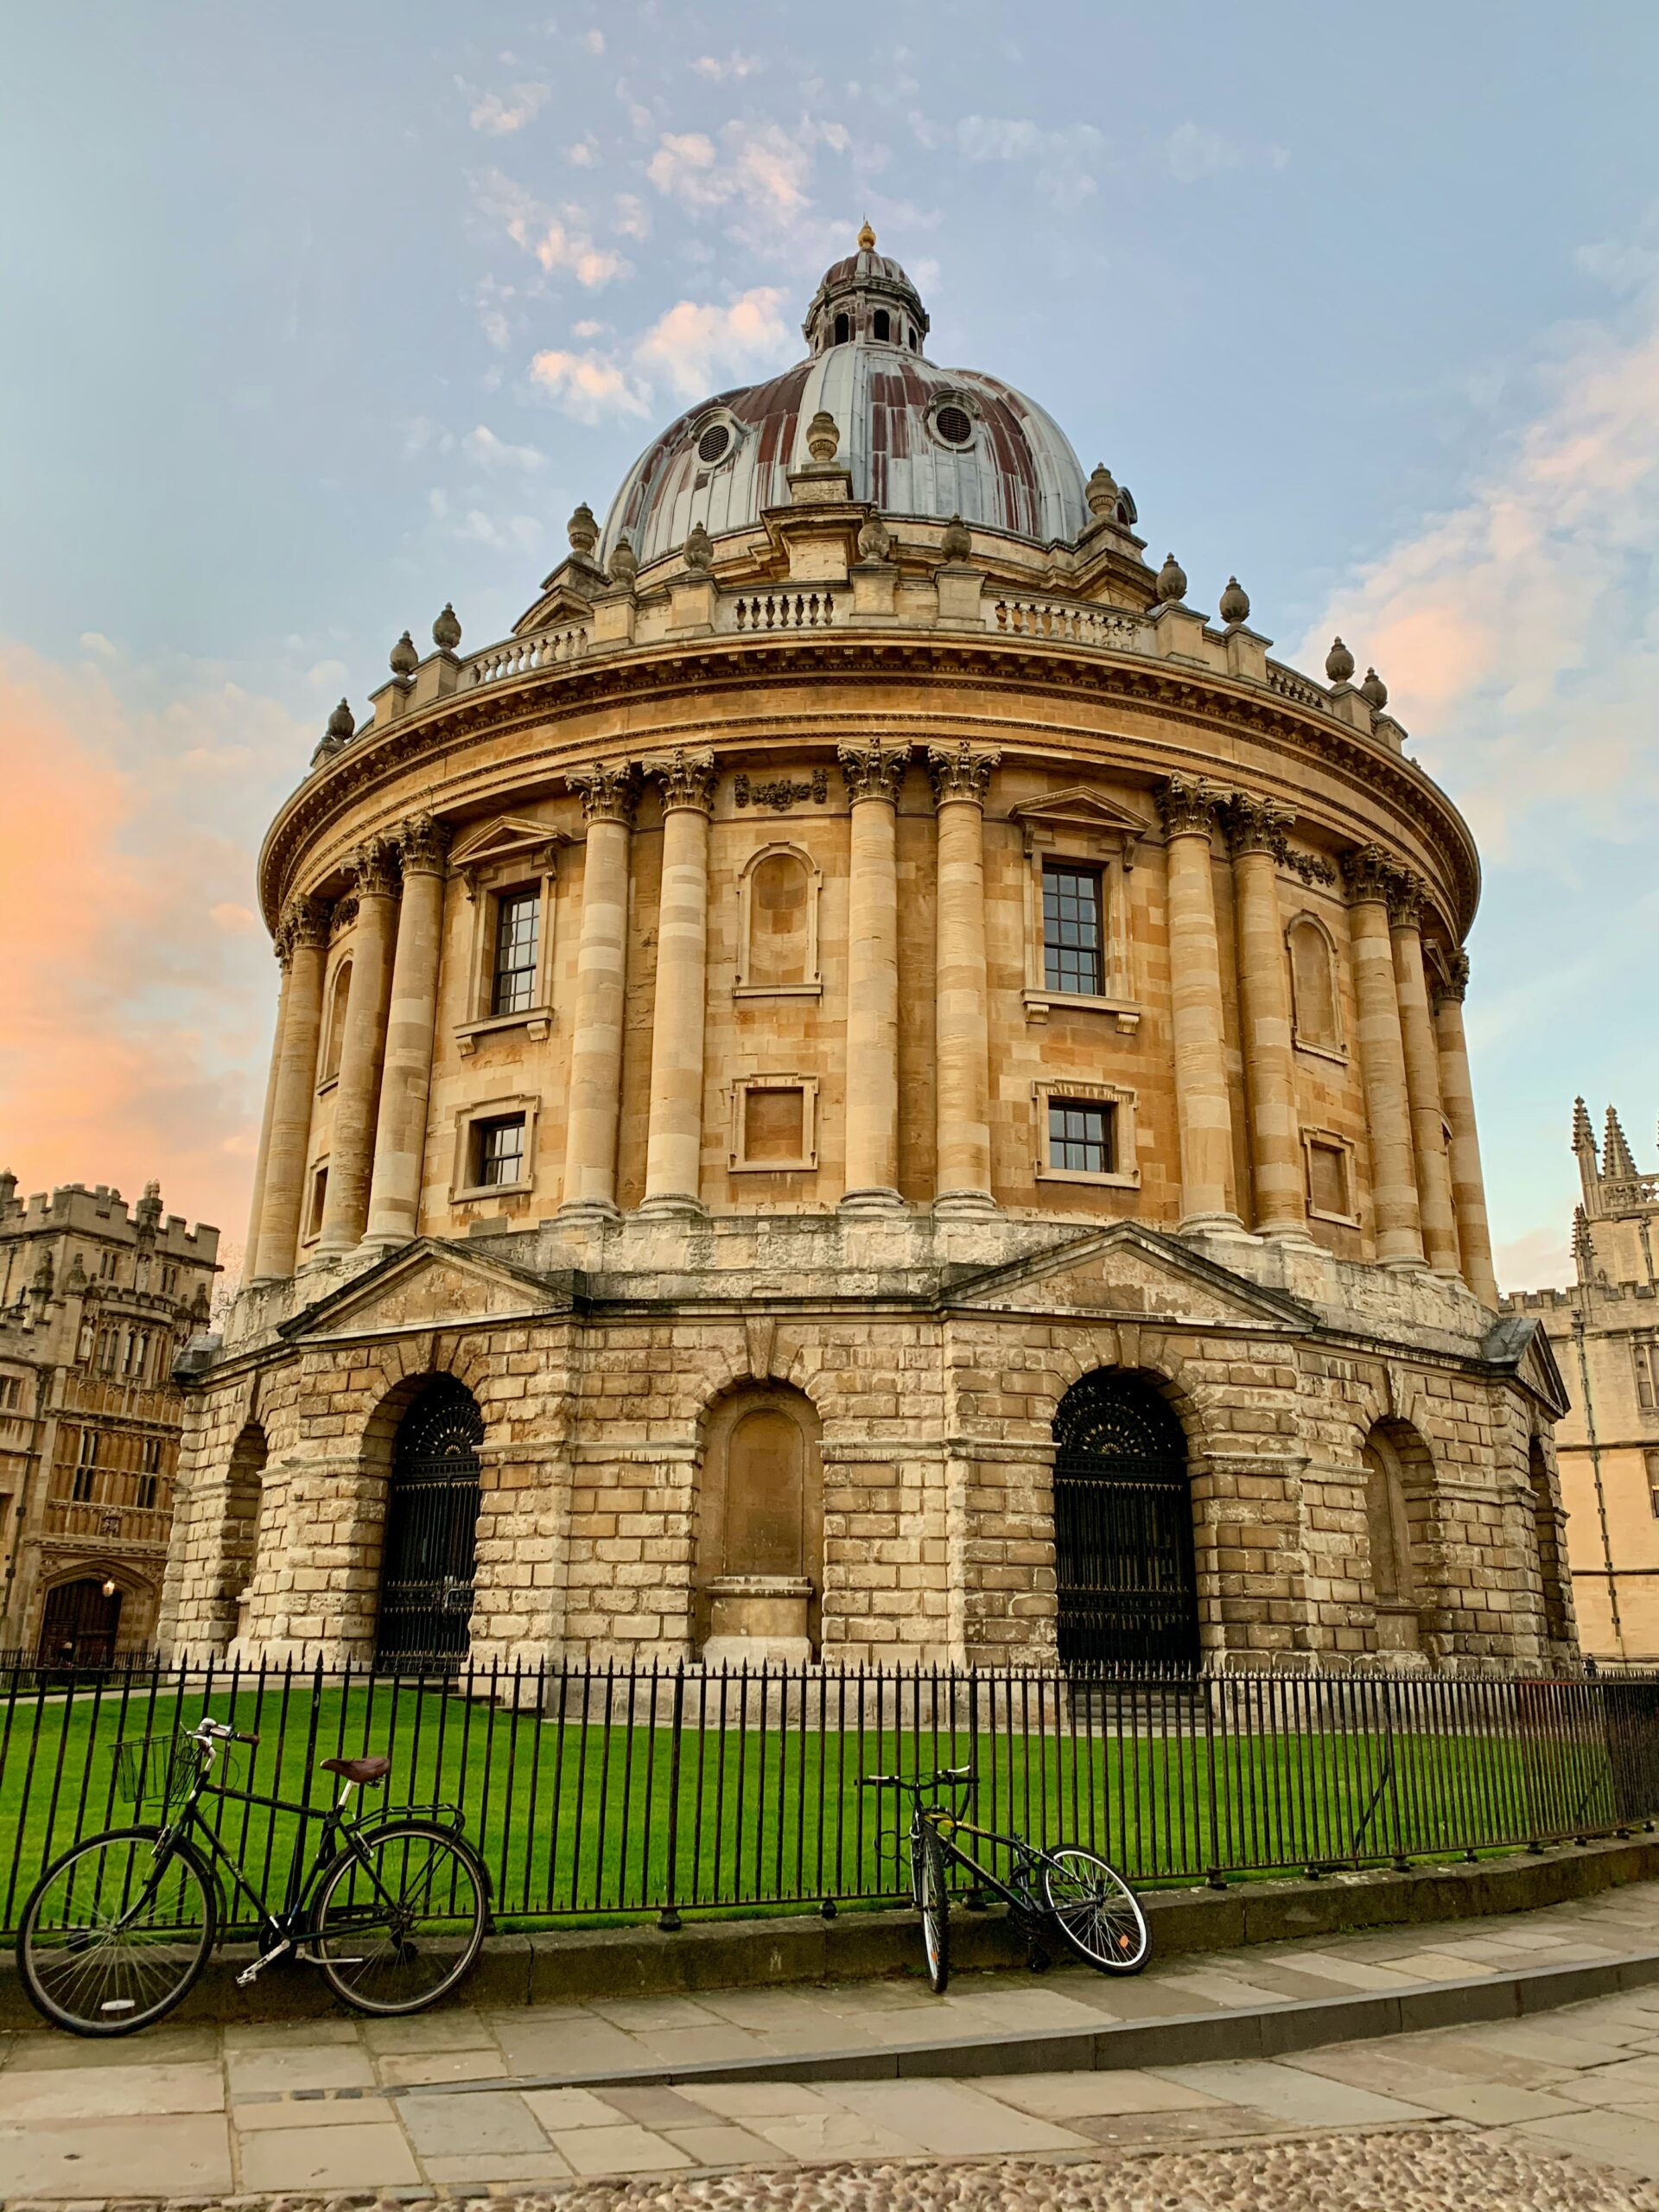 Oxford Windsor and Eton